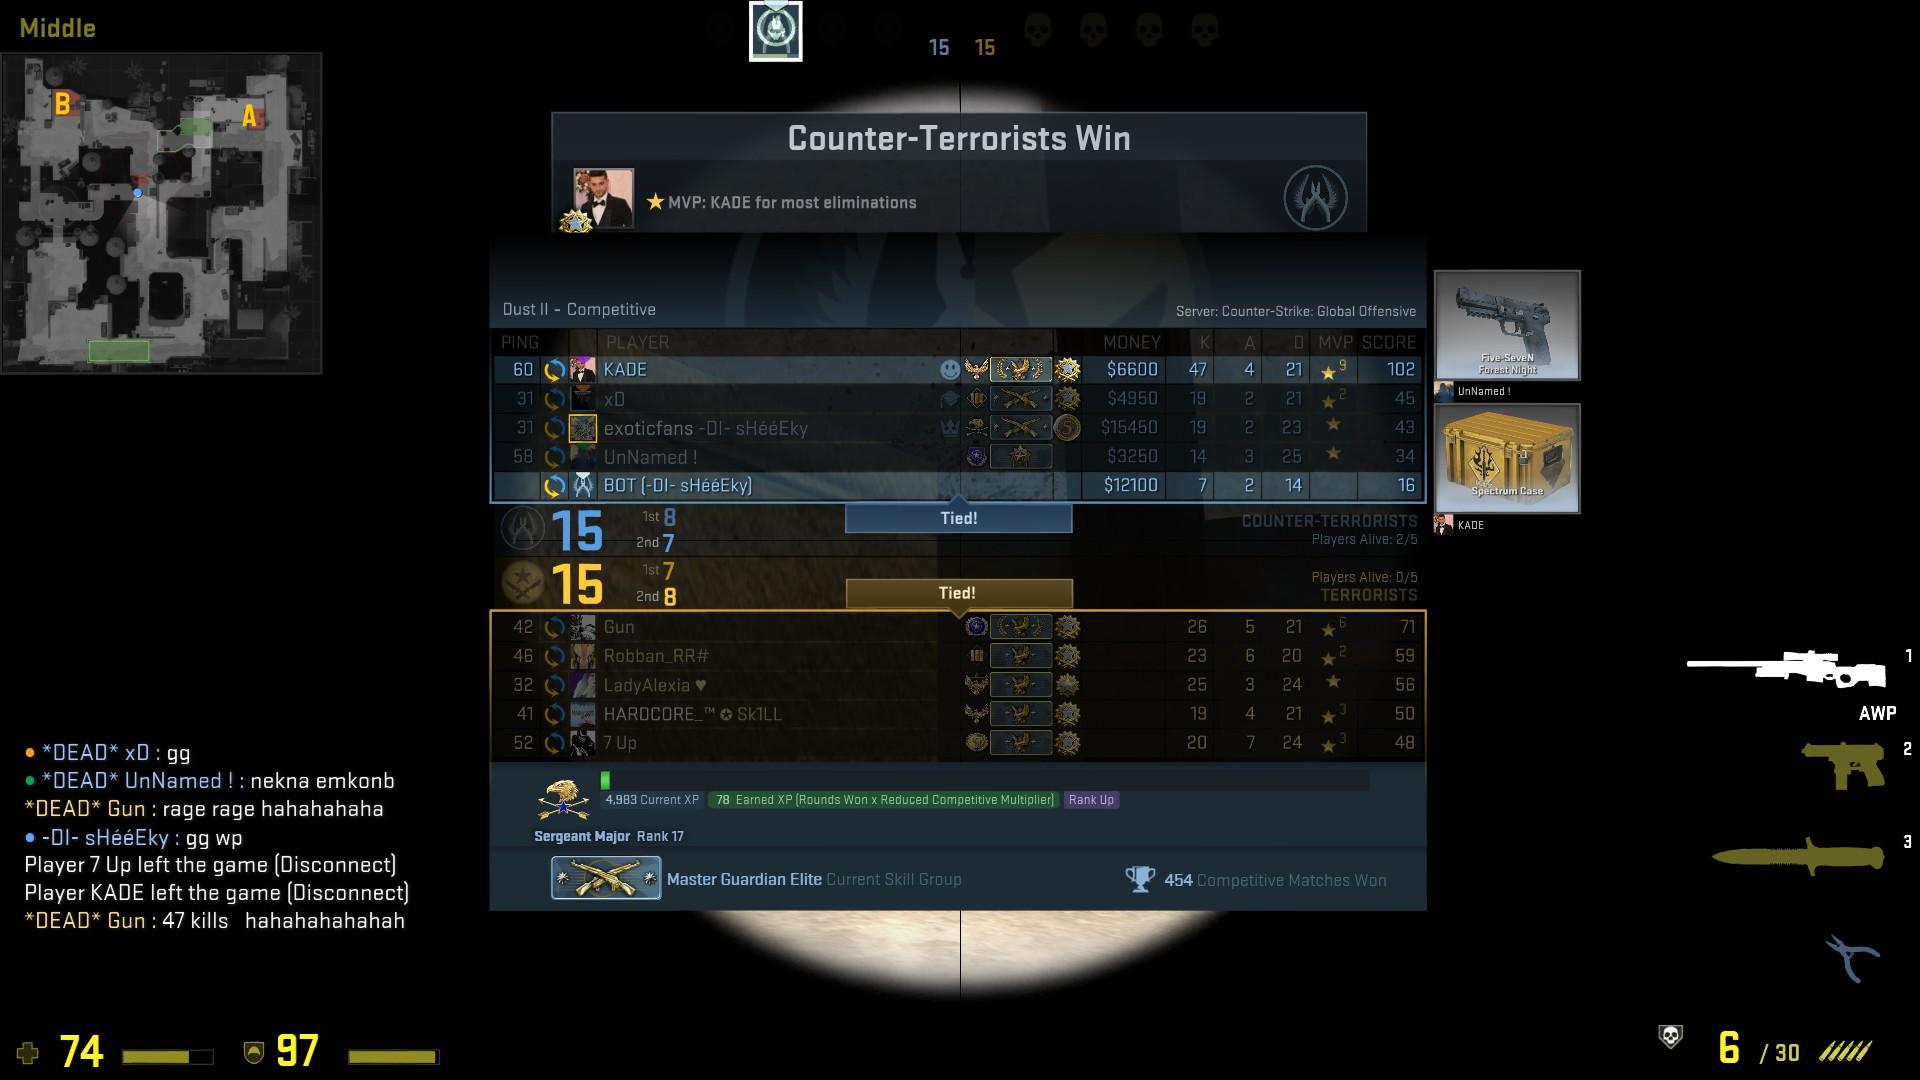 matchmaking lol matchmaking online i gujarati